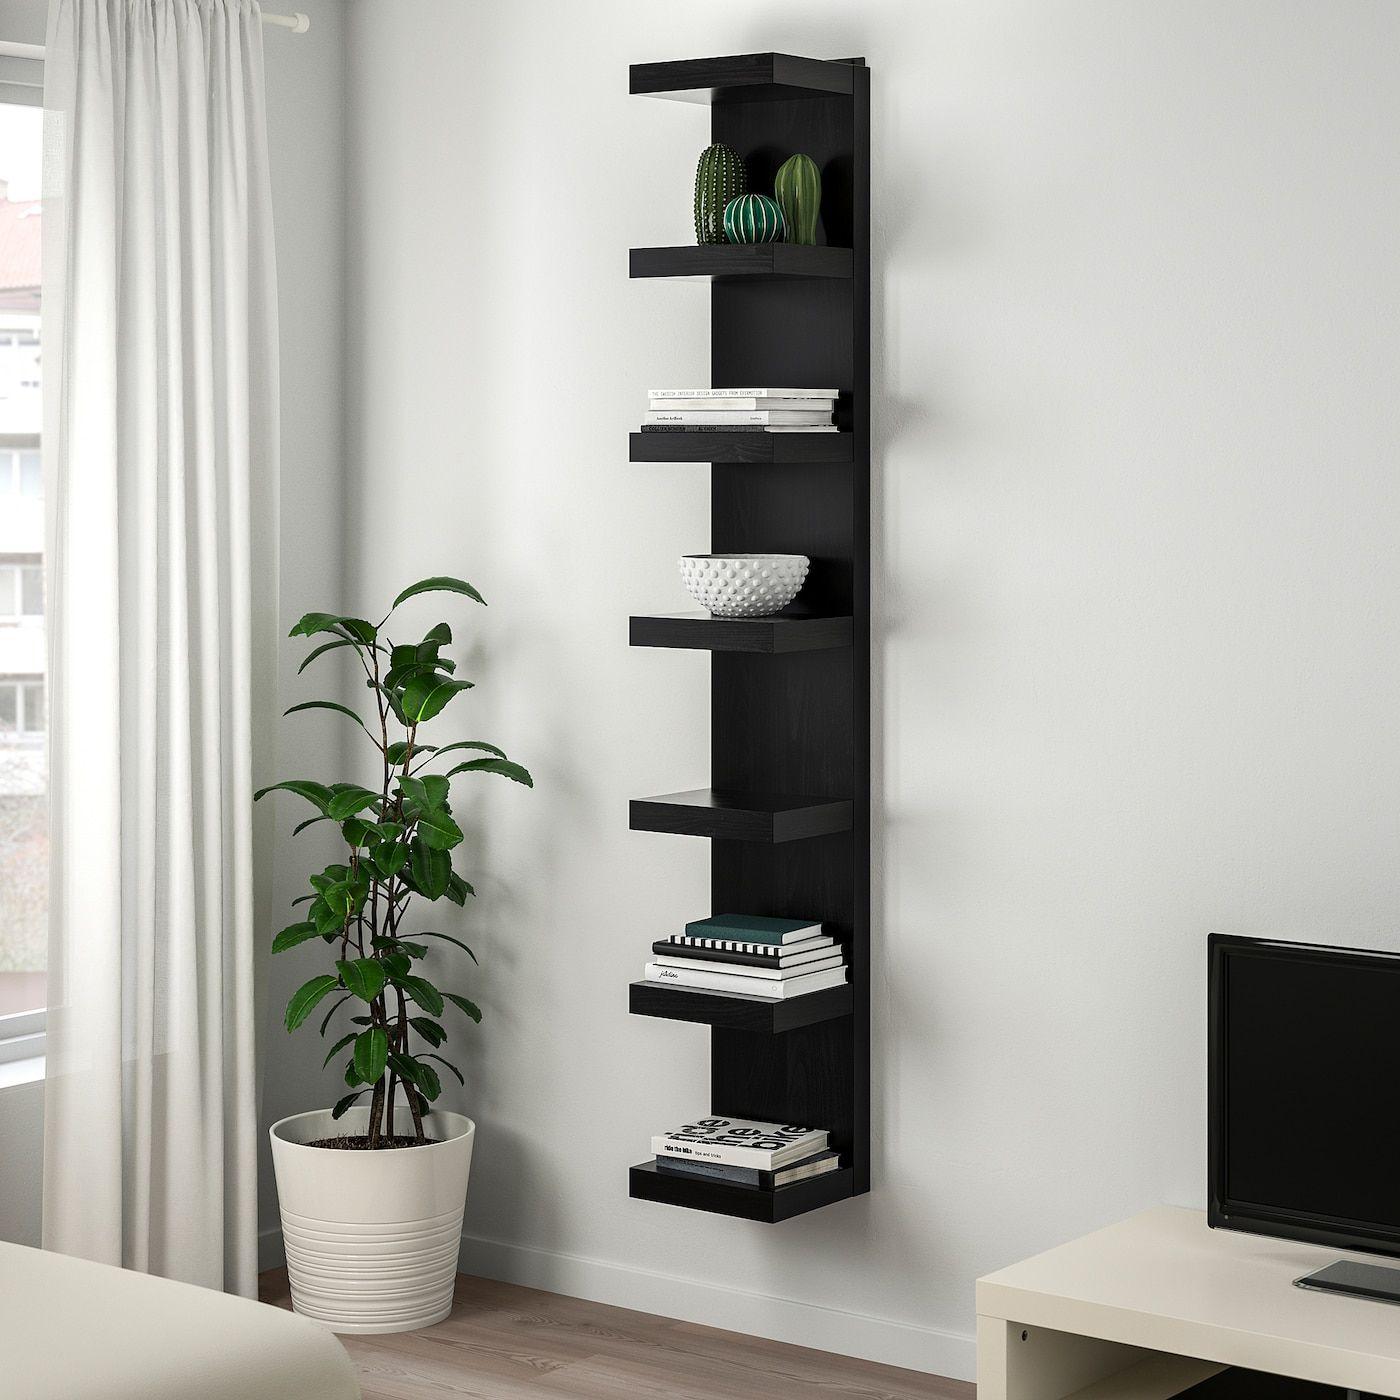 Lack Wall Shelf Unit Black Brown 11 3 4x74 3 4 Ikea In 2020